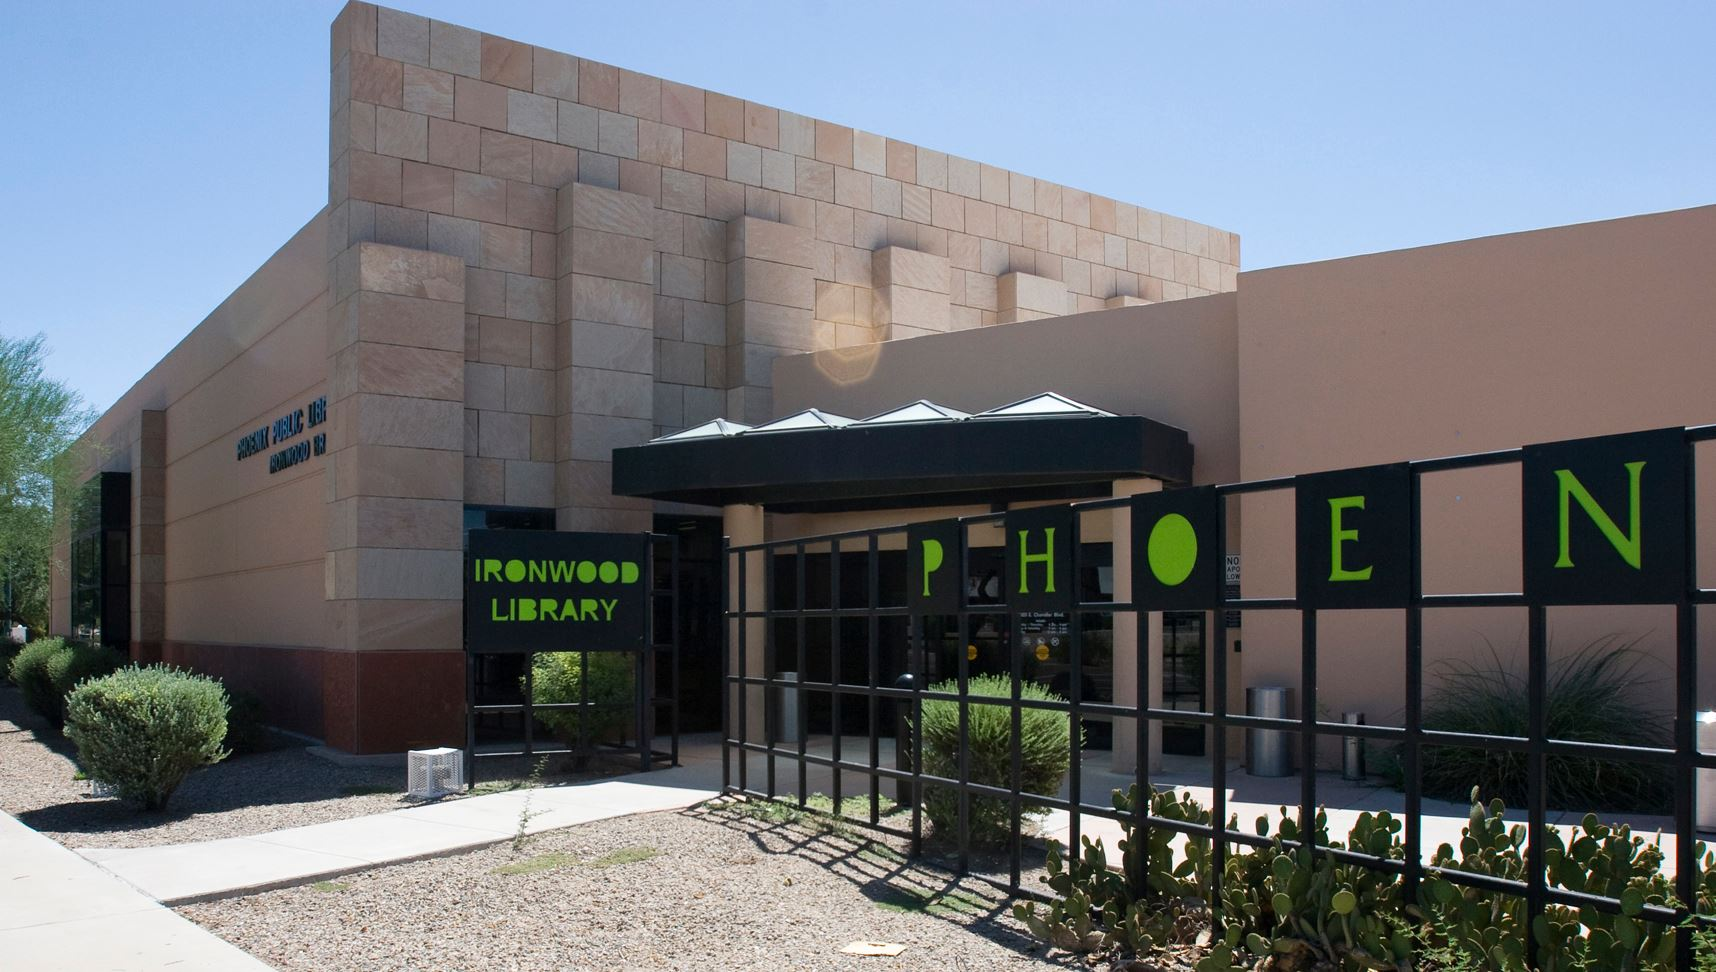 Phoenix Public Library - Ironwood Library